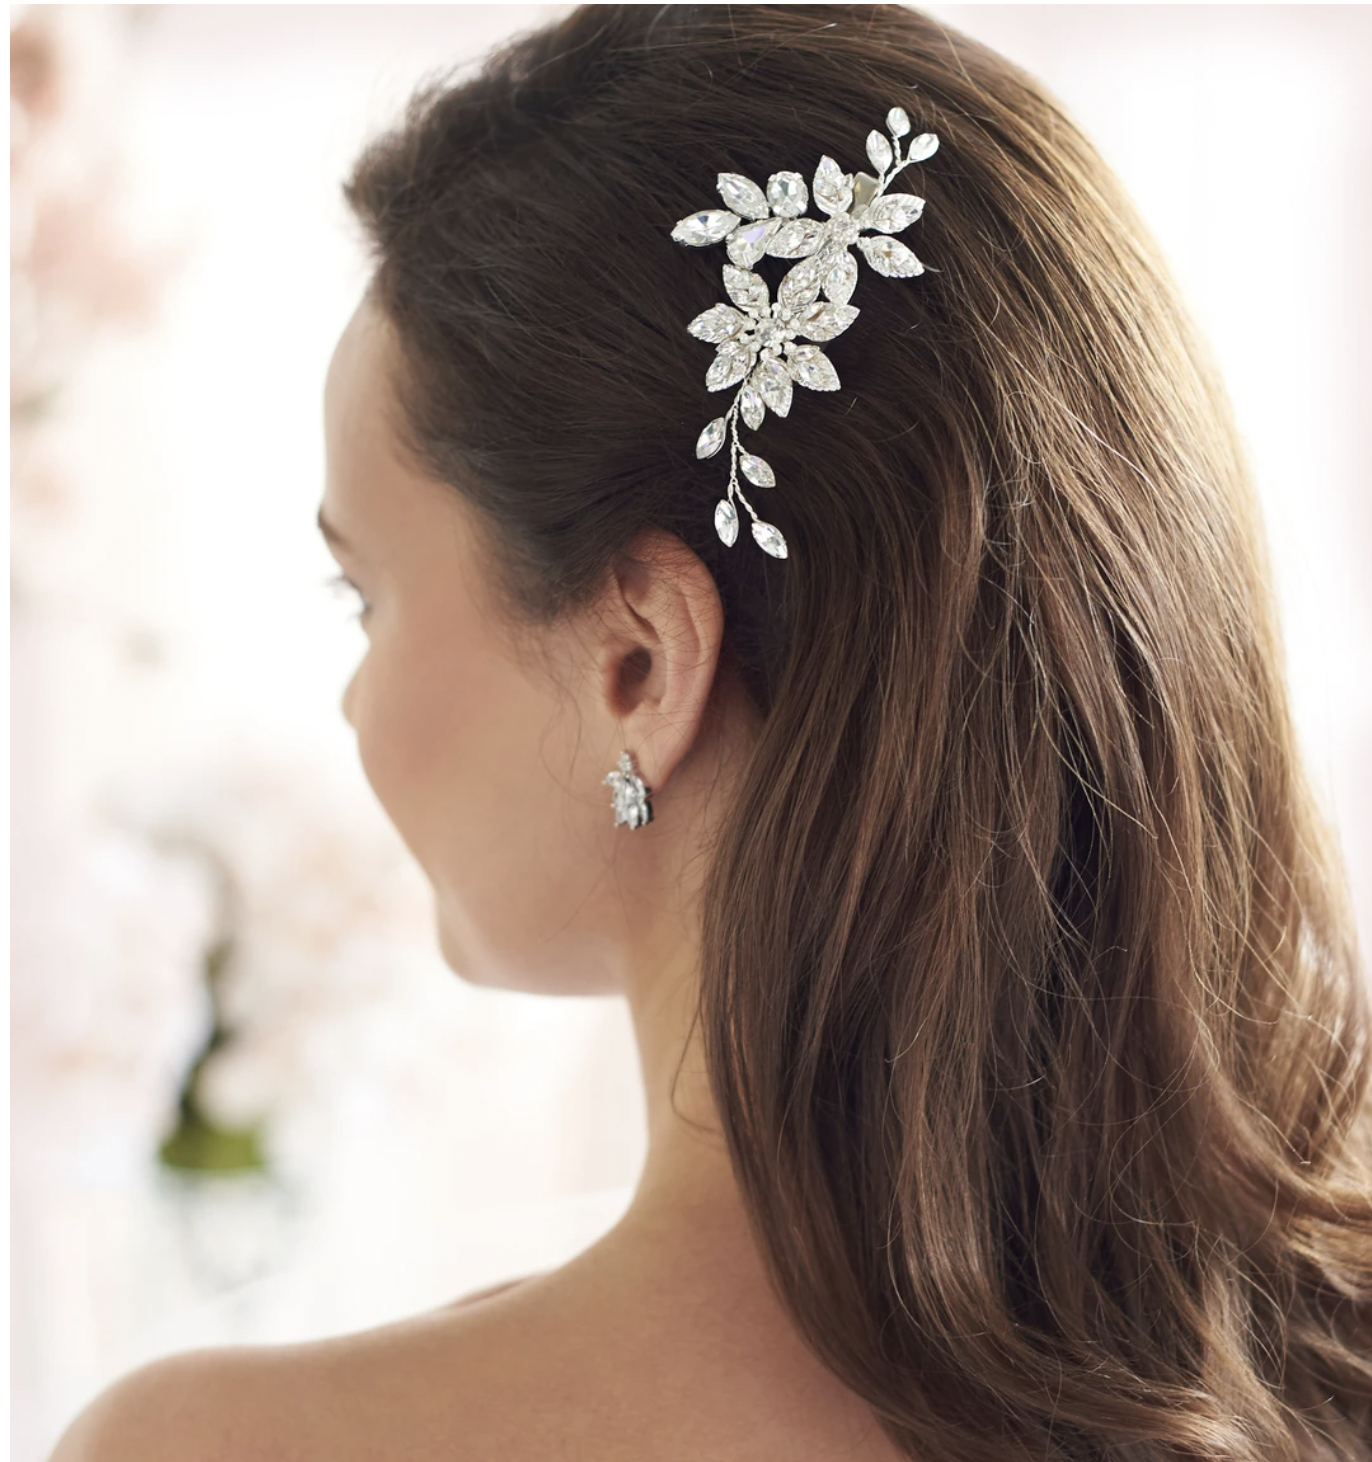 Floral Pearl Center Crystal Hair Clip